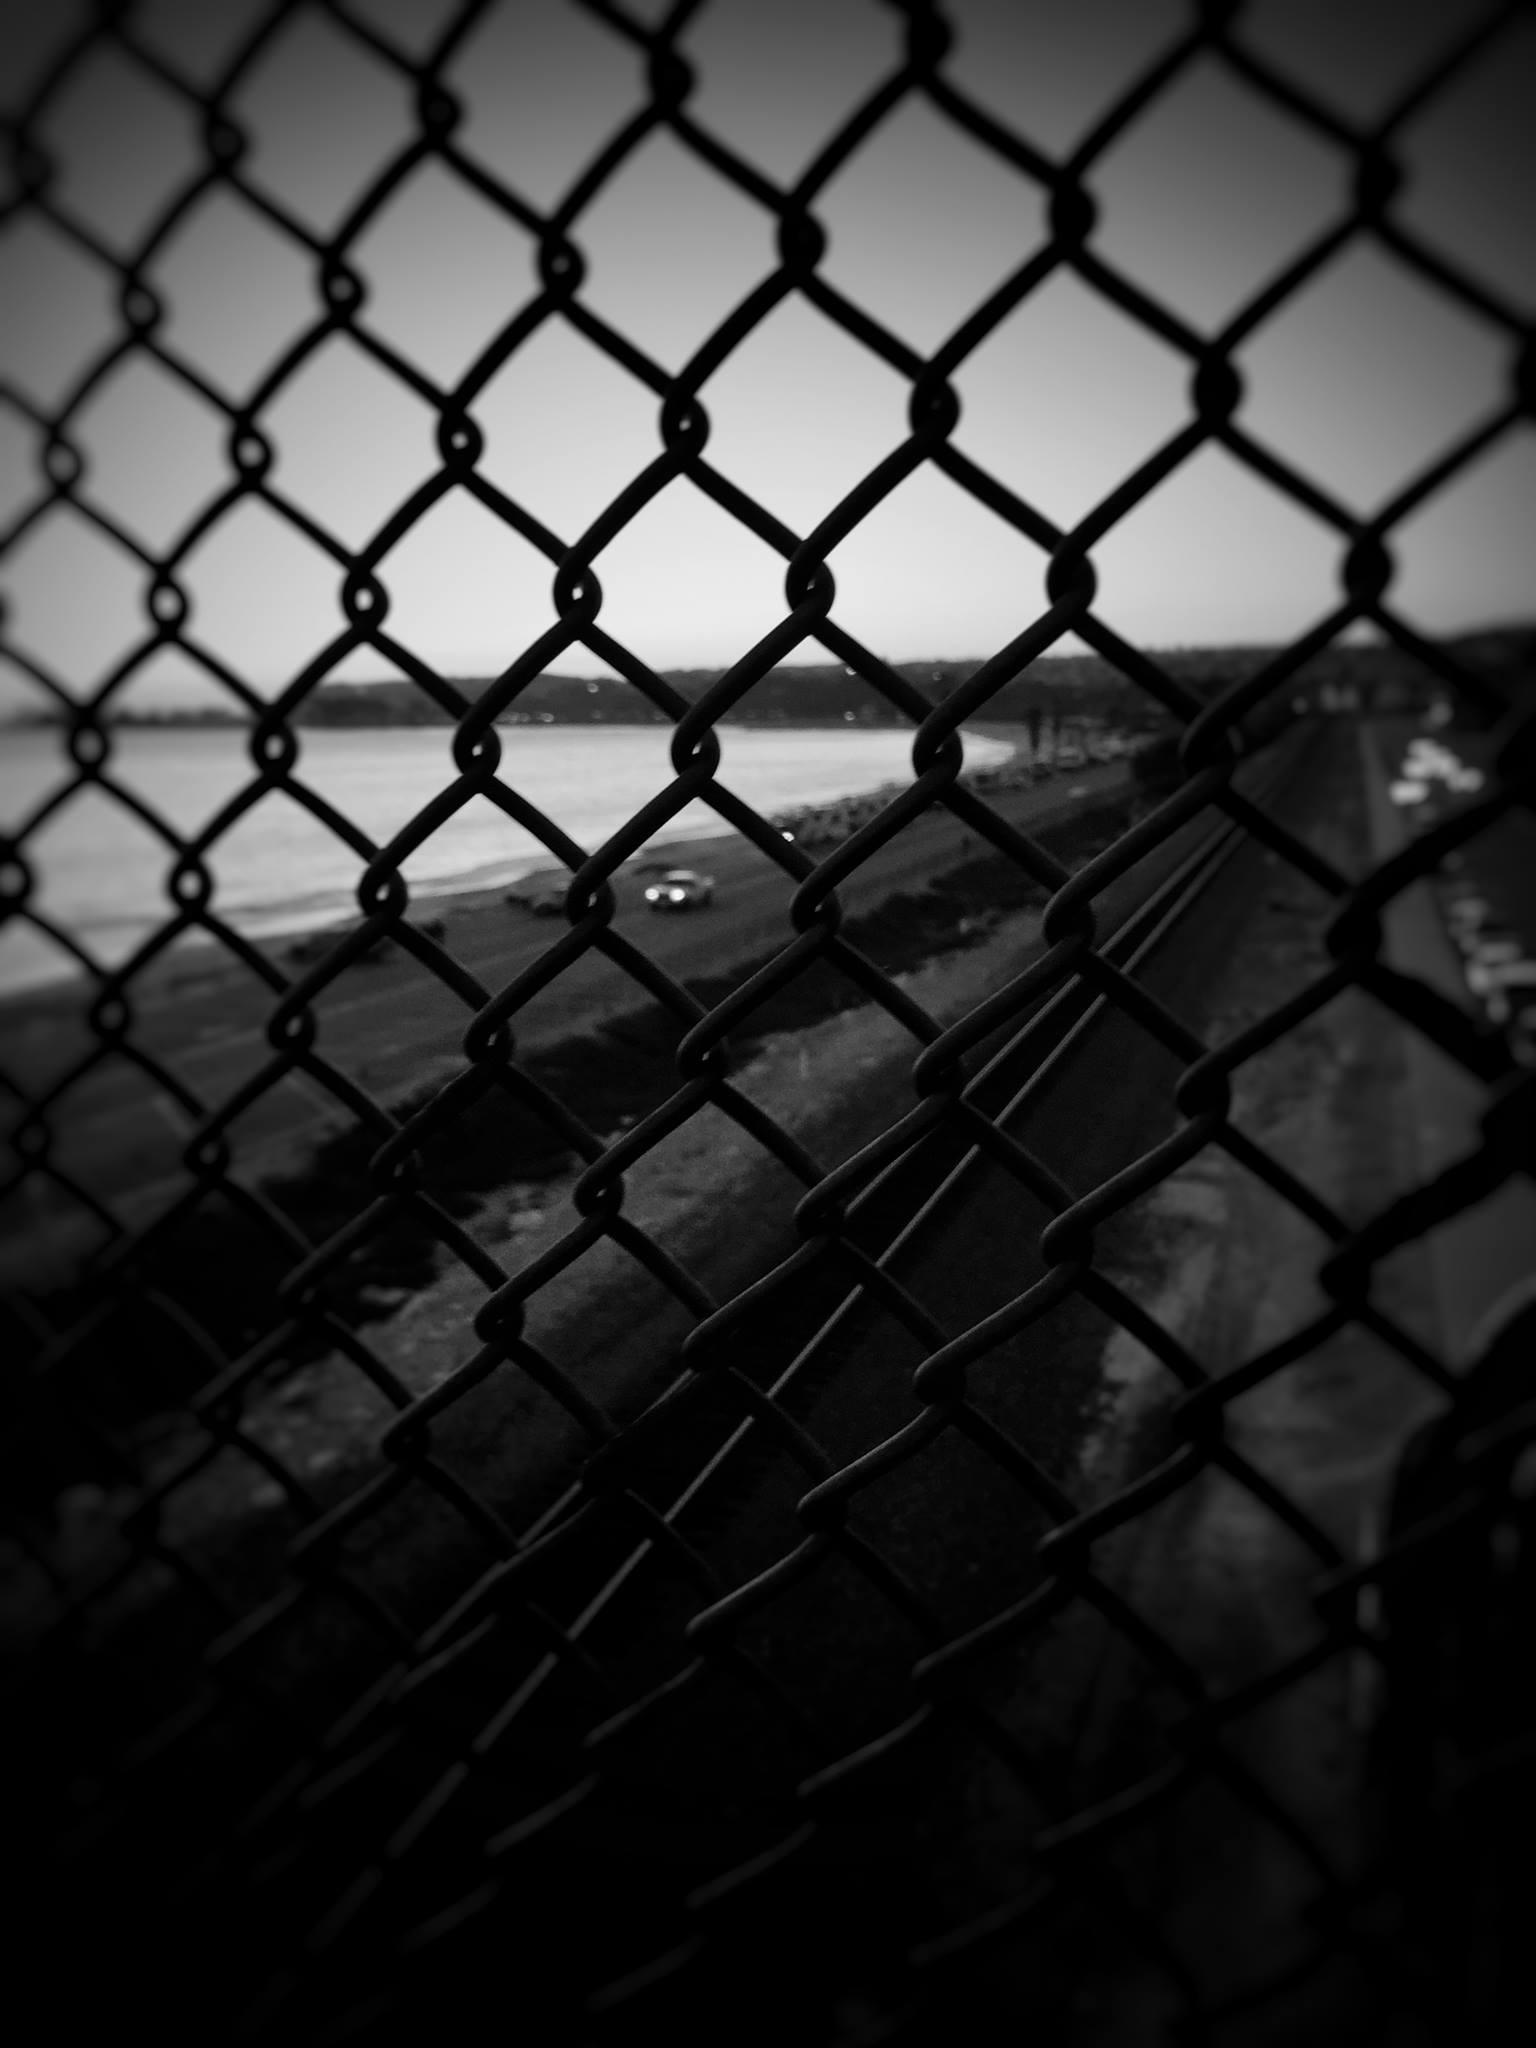 fence_1.jpg